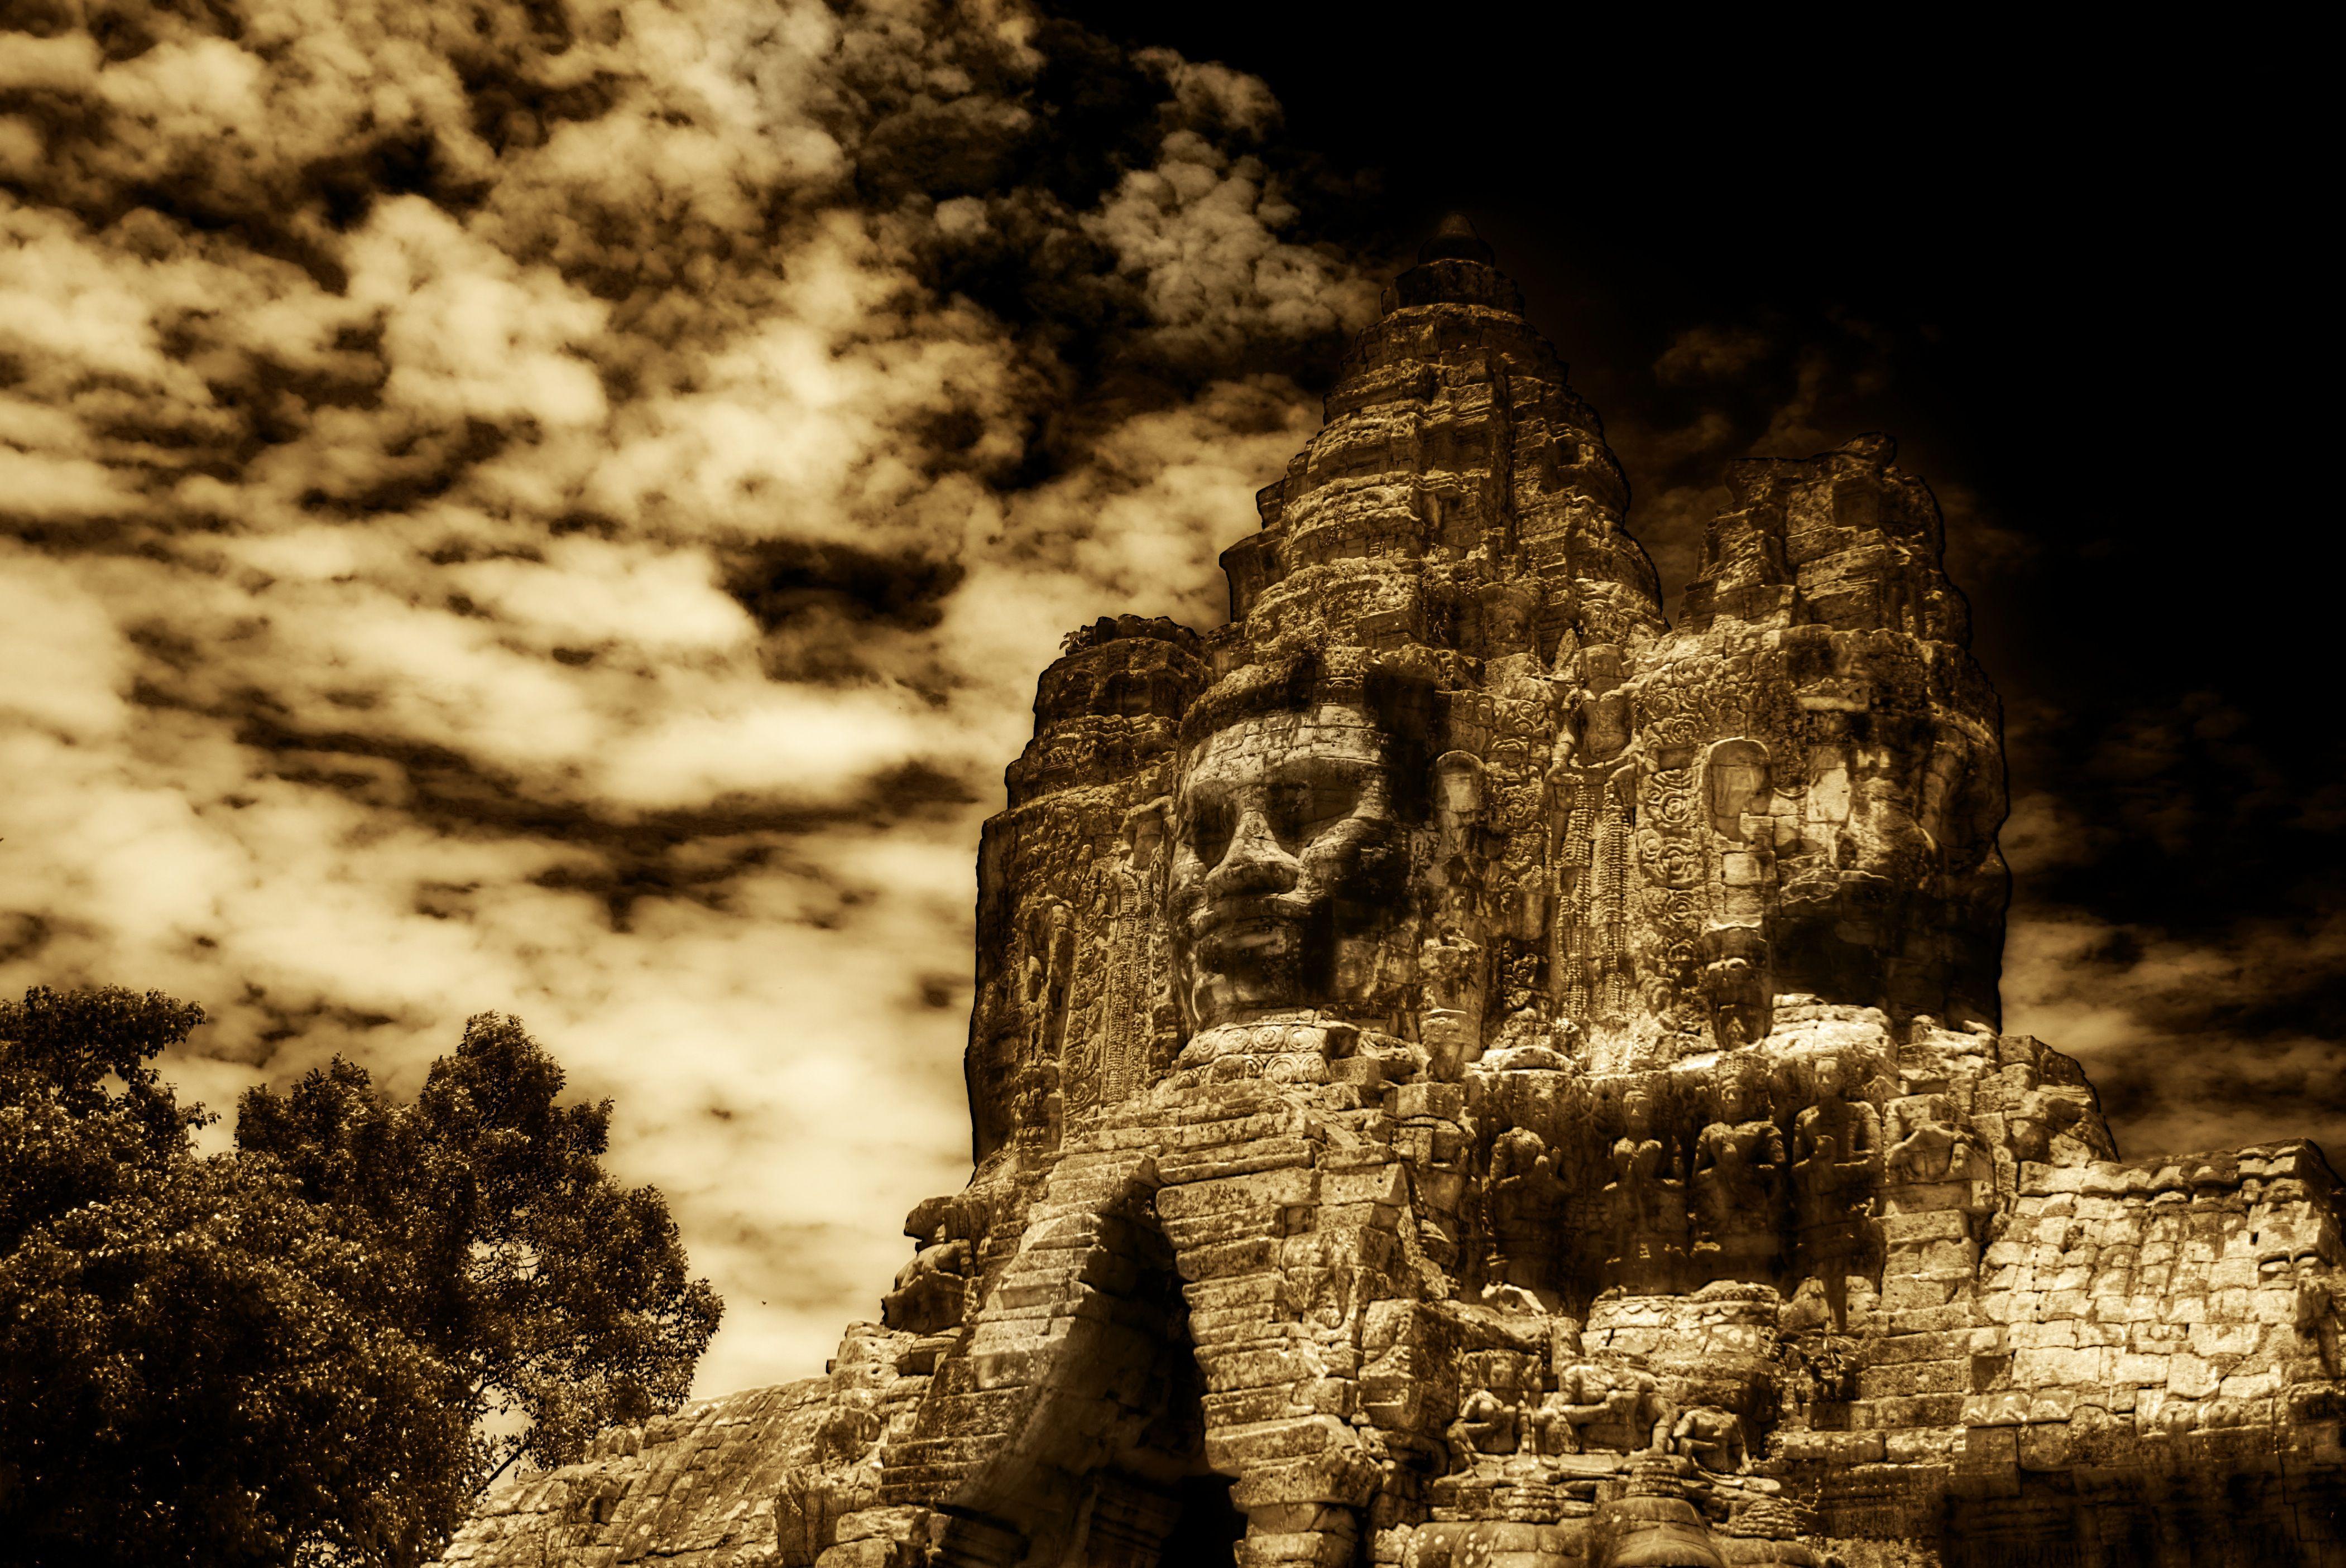 Buddha Wallpaper 8k: Buddha 4K Ultra HD Wallpapers